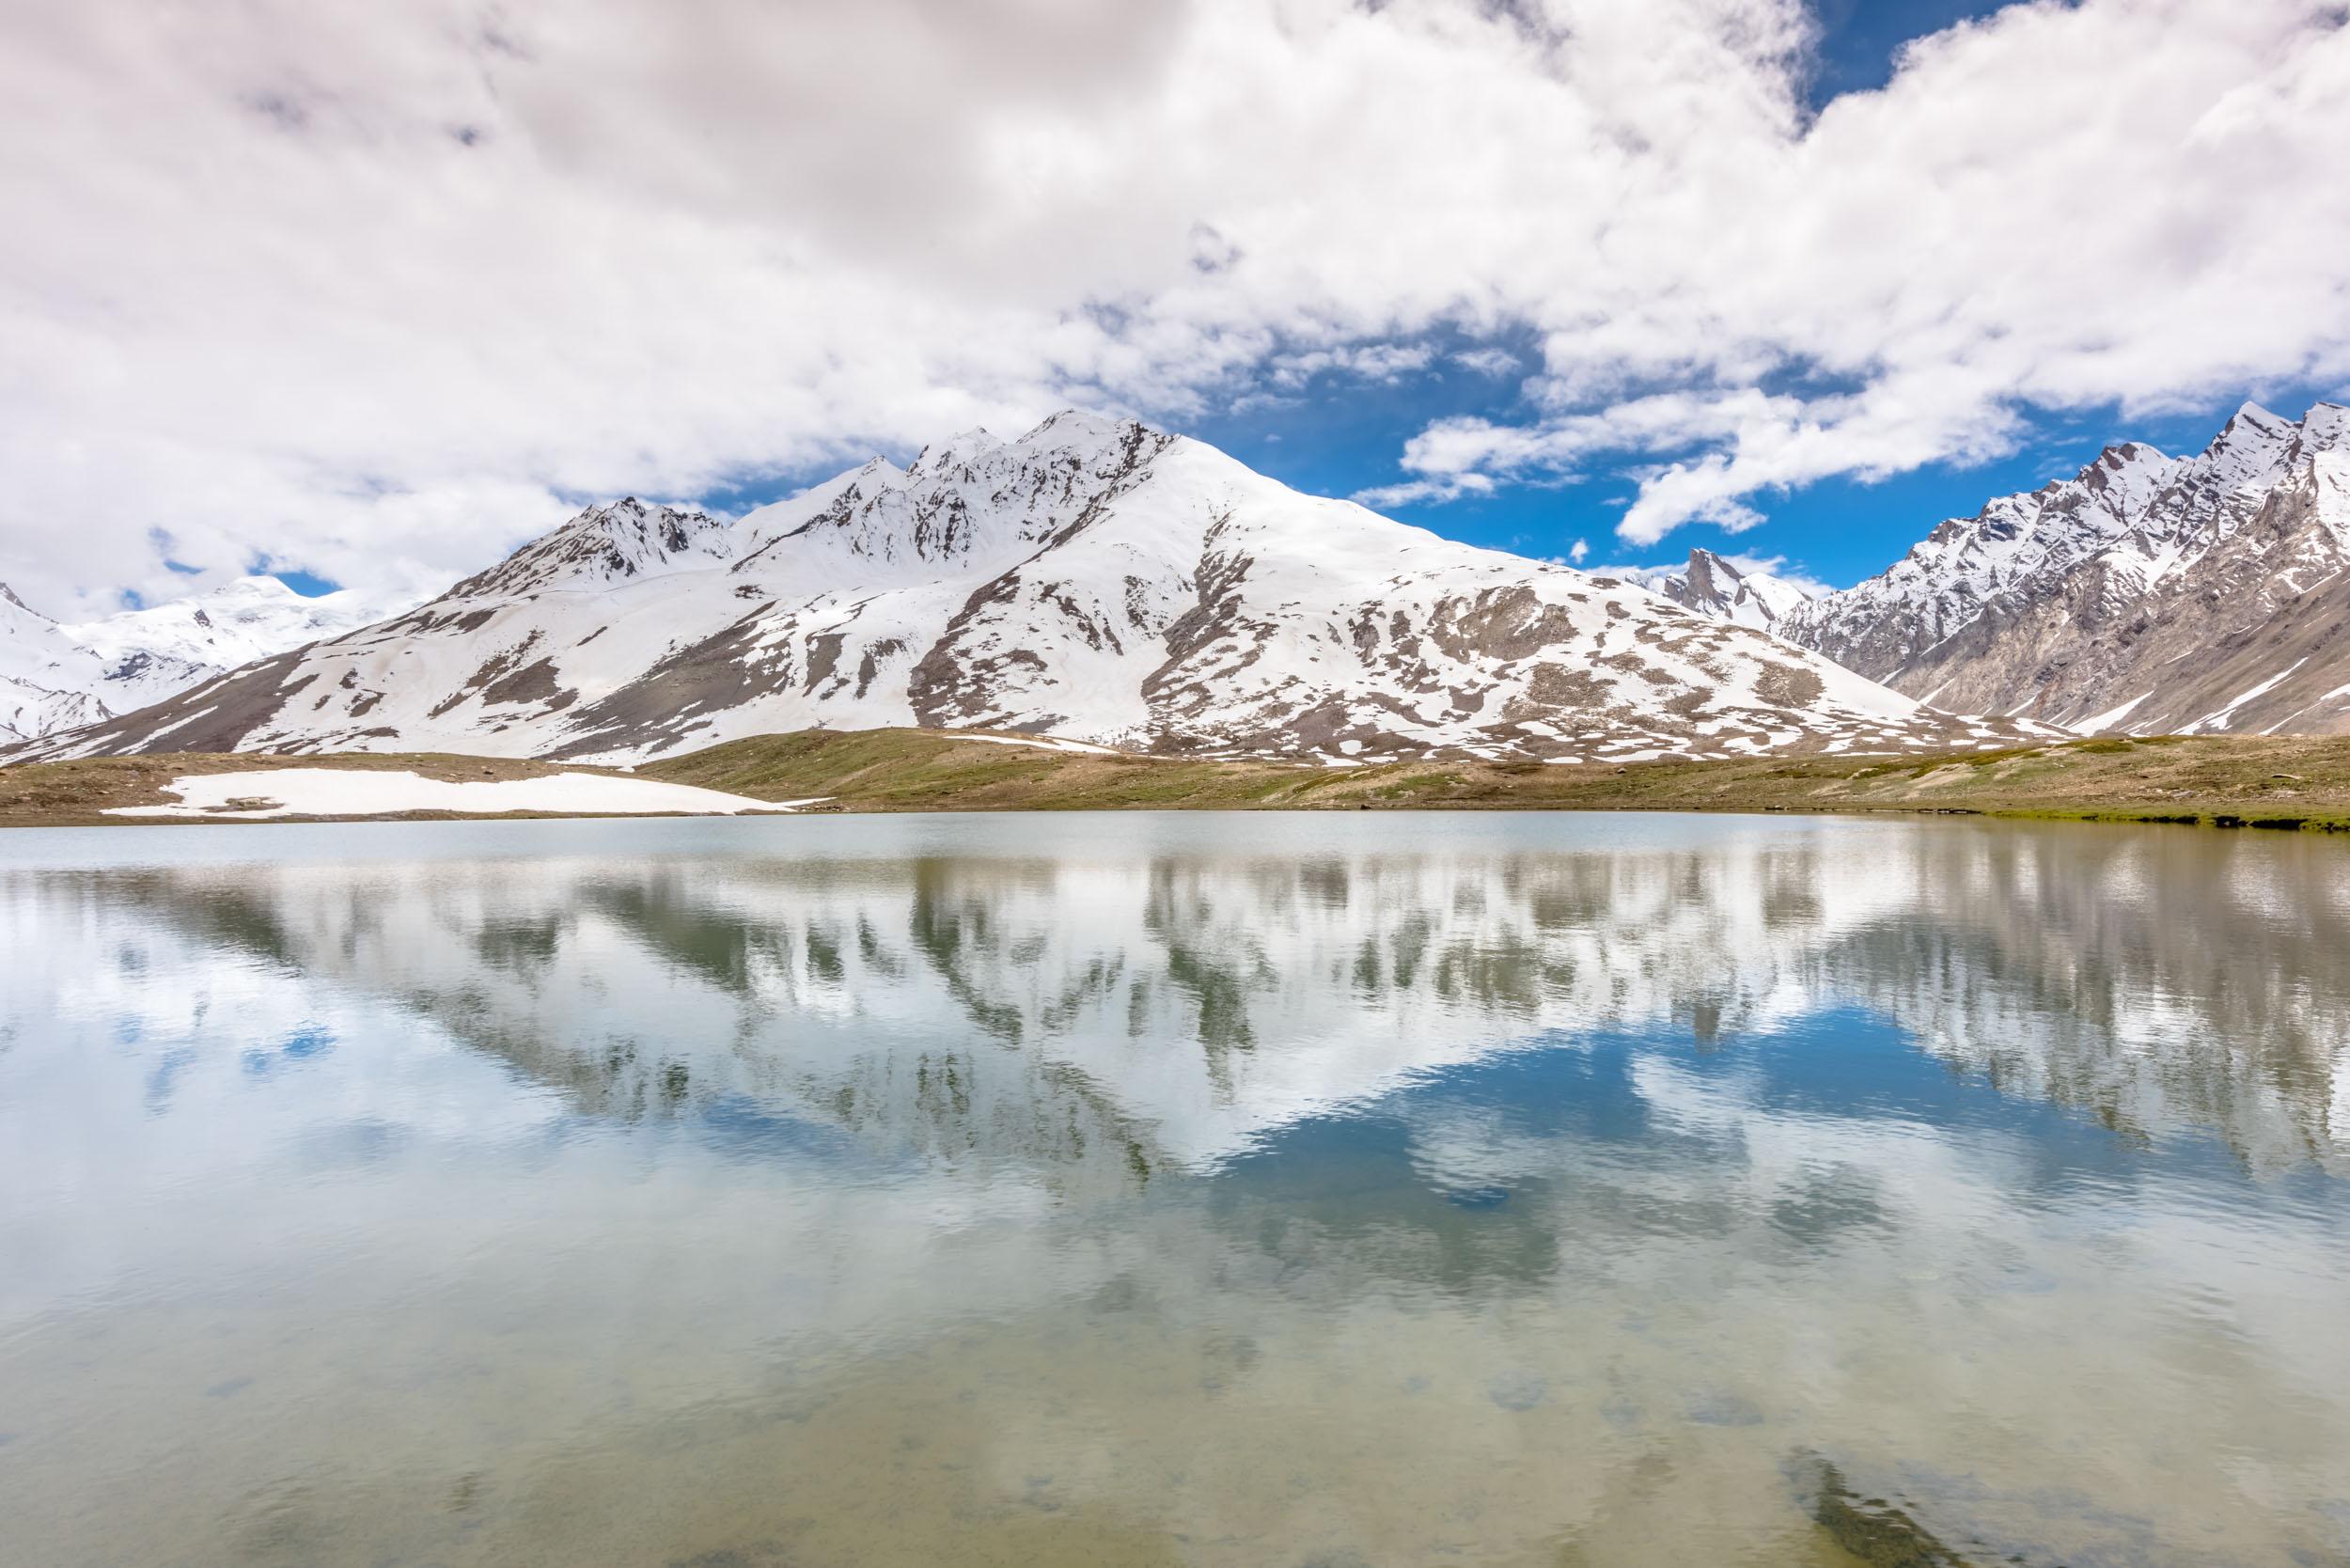 Stat Tso and Lang Tso are the twin lakes near pensi la pass